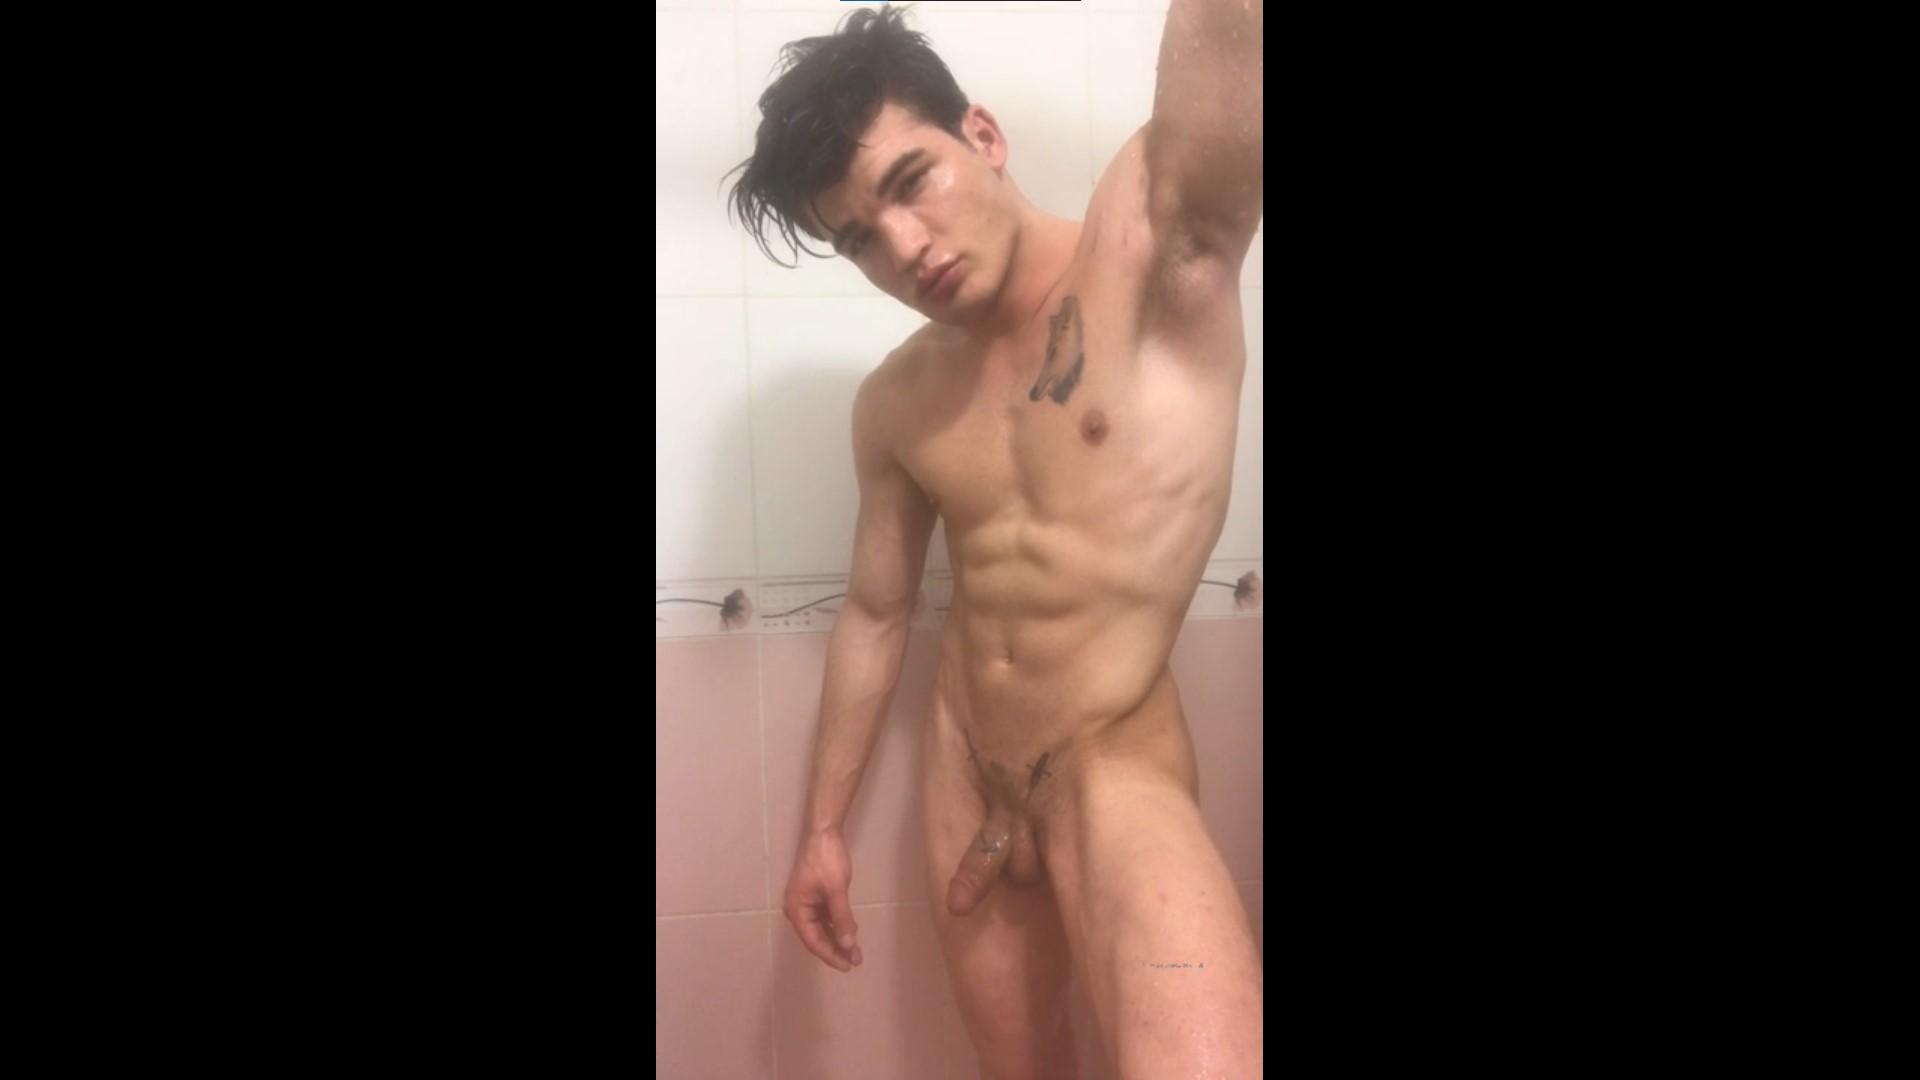 Showing off my naked body in the shower - Kurtdövmeli